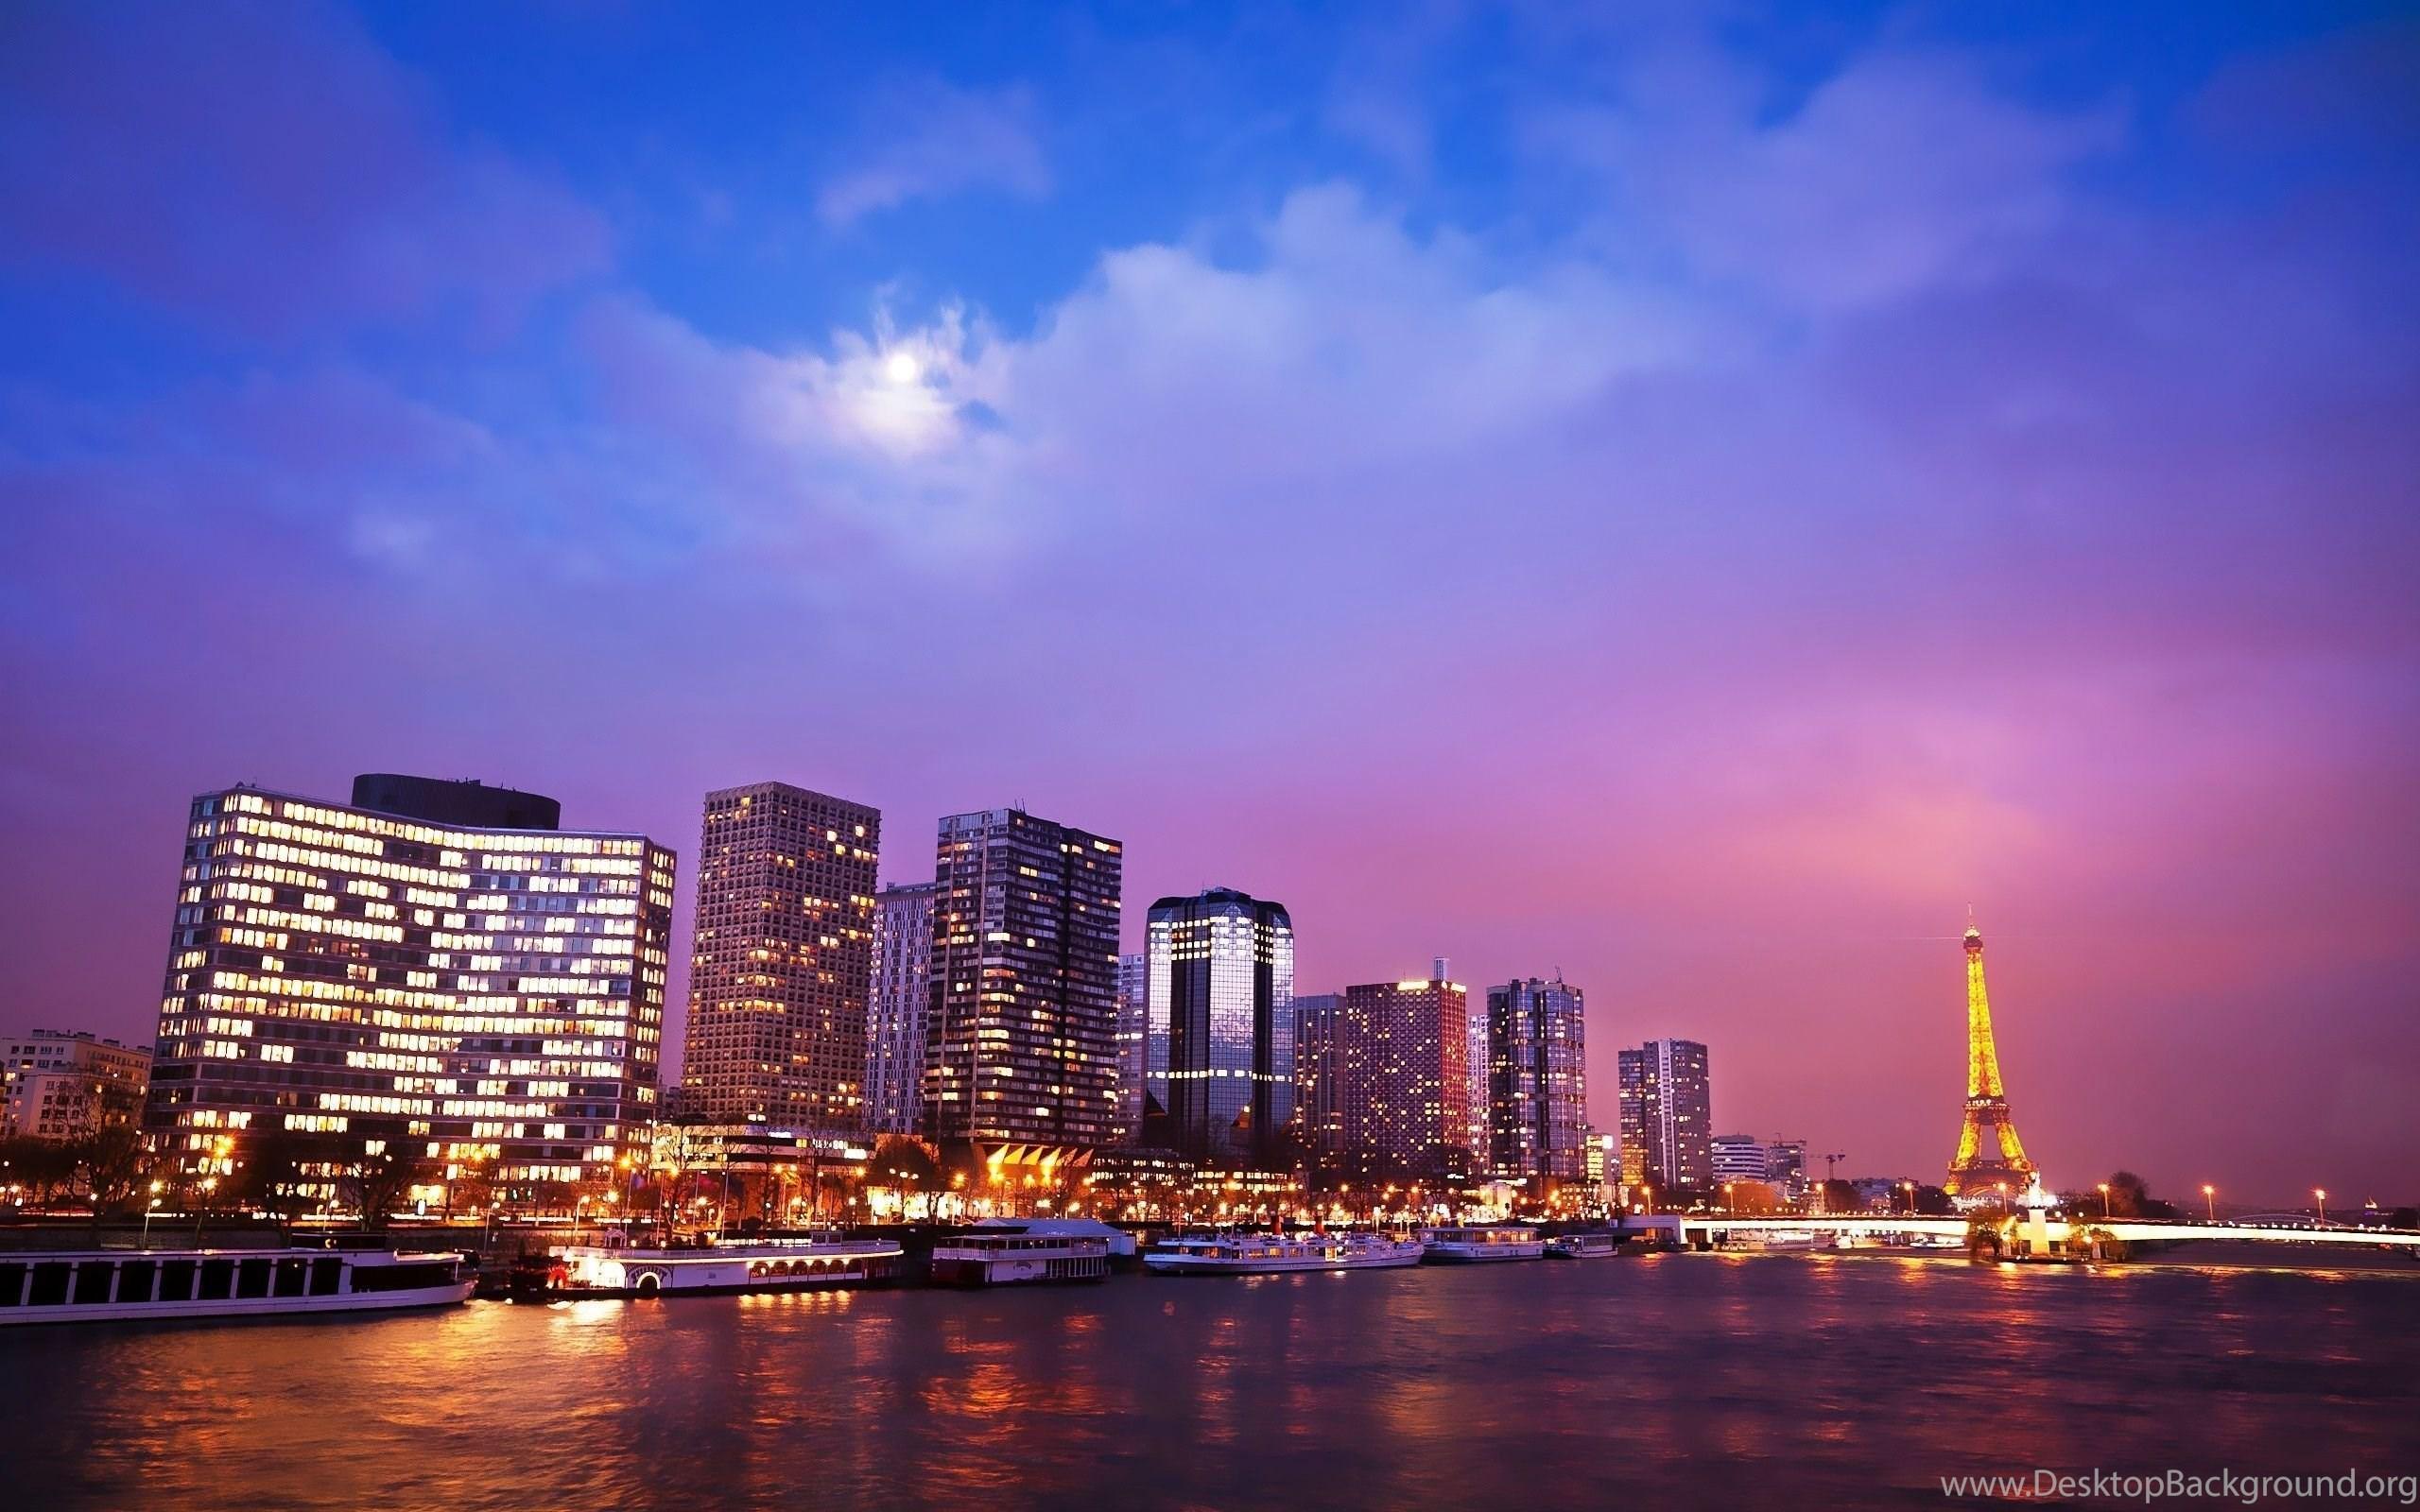 High Resolution Beautiful Paris City Night Wallpapers Hd 5 Desktop Background